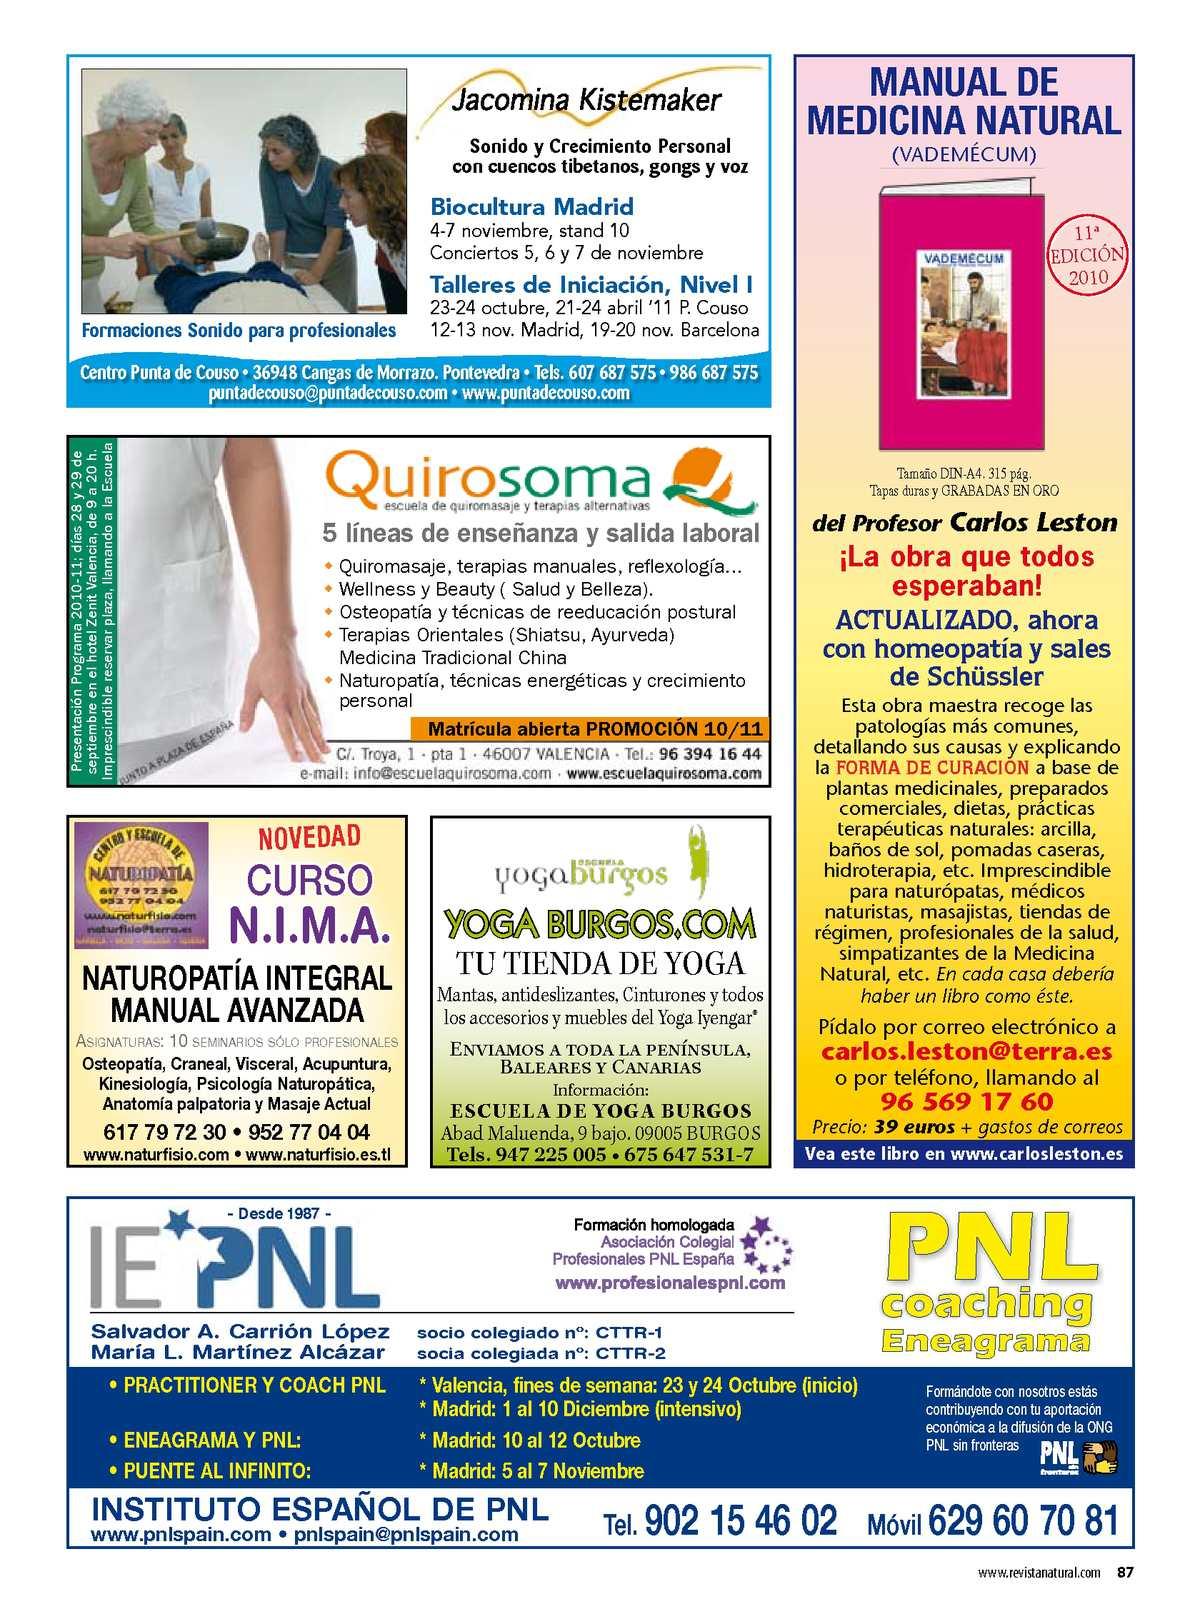 Reflexologia para bajar de peso video downloader